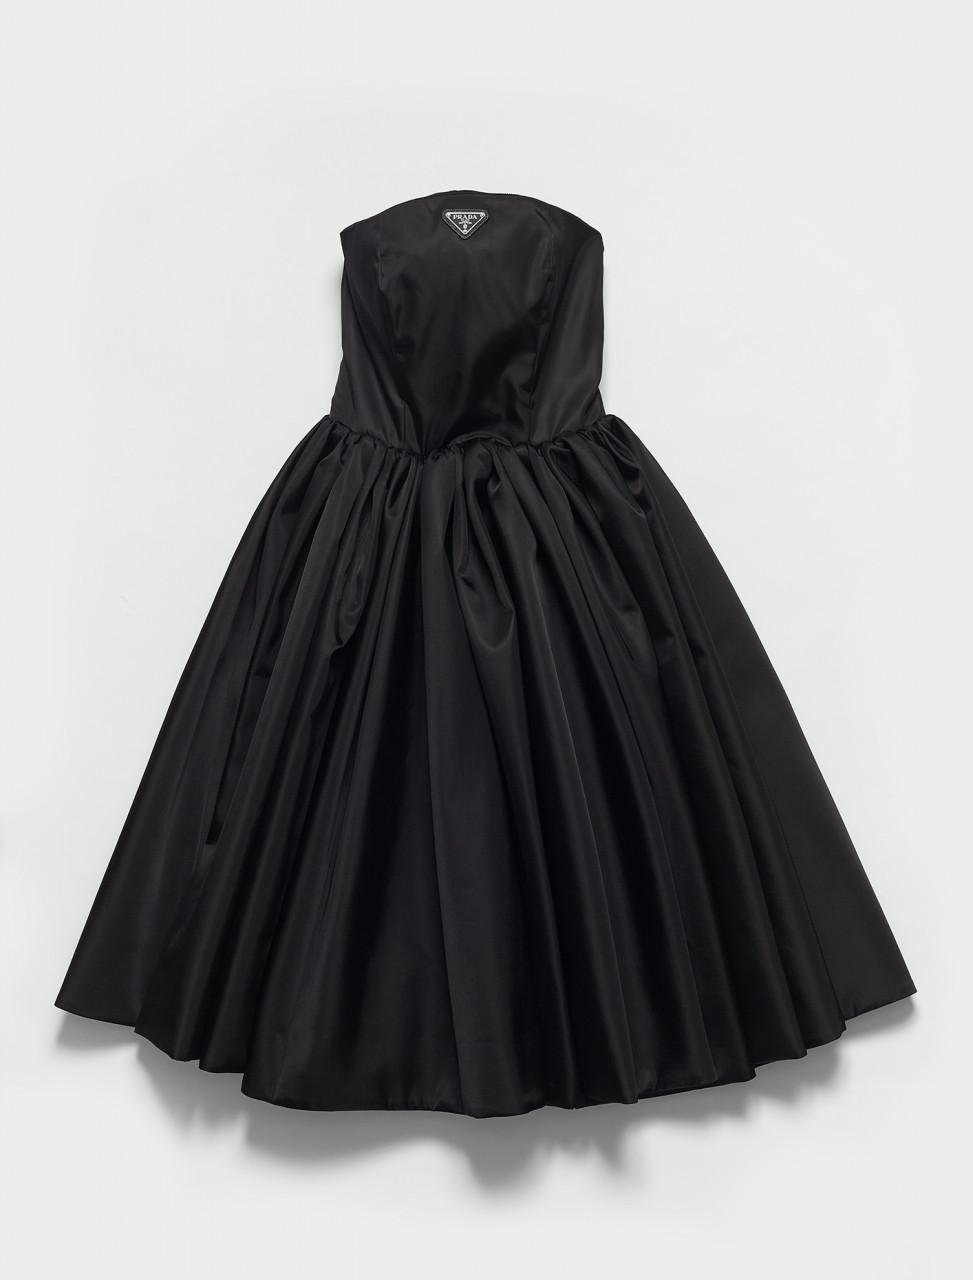 230647-F0002 PRADA RE NYLON CORSET DRESS IN BLACK